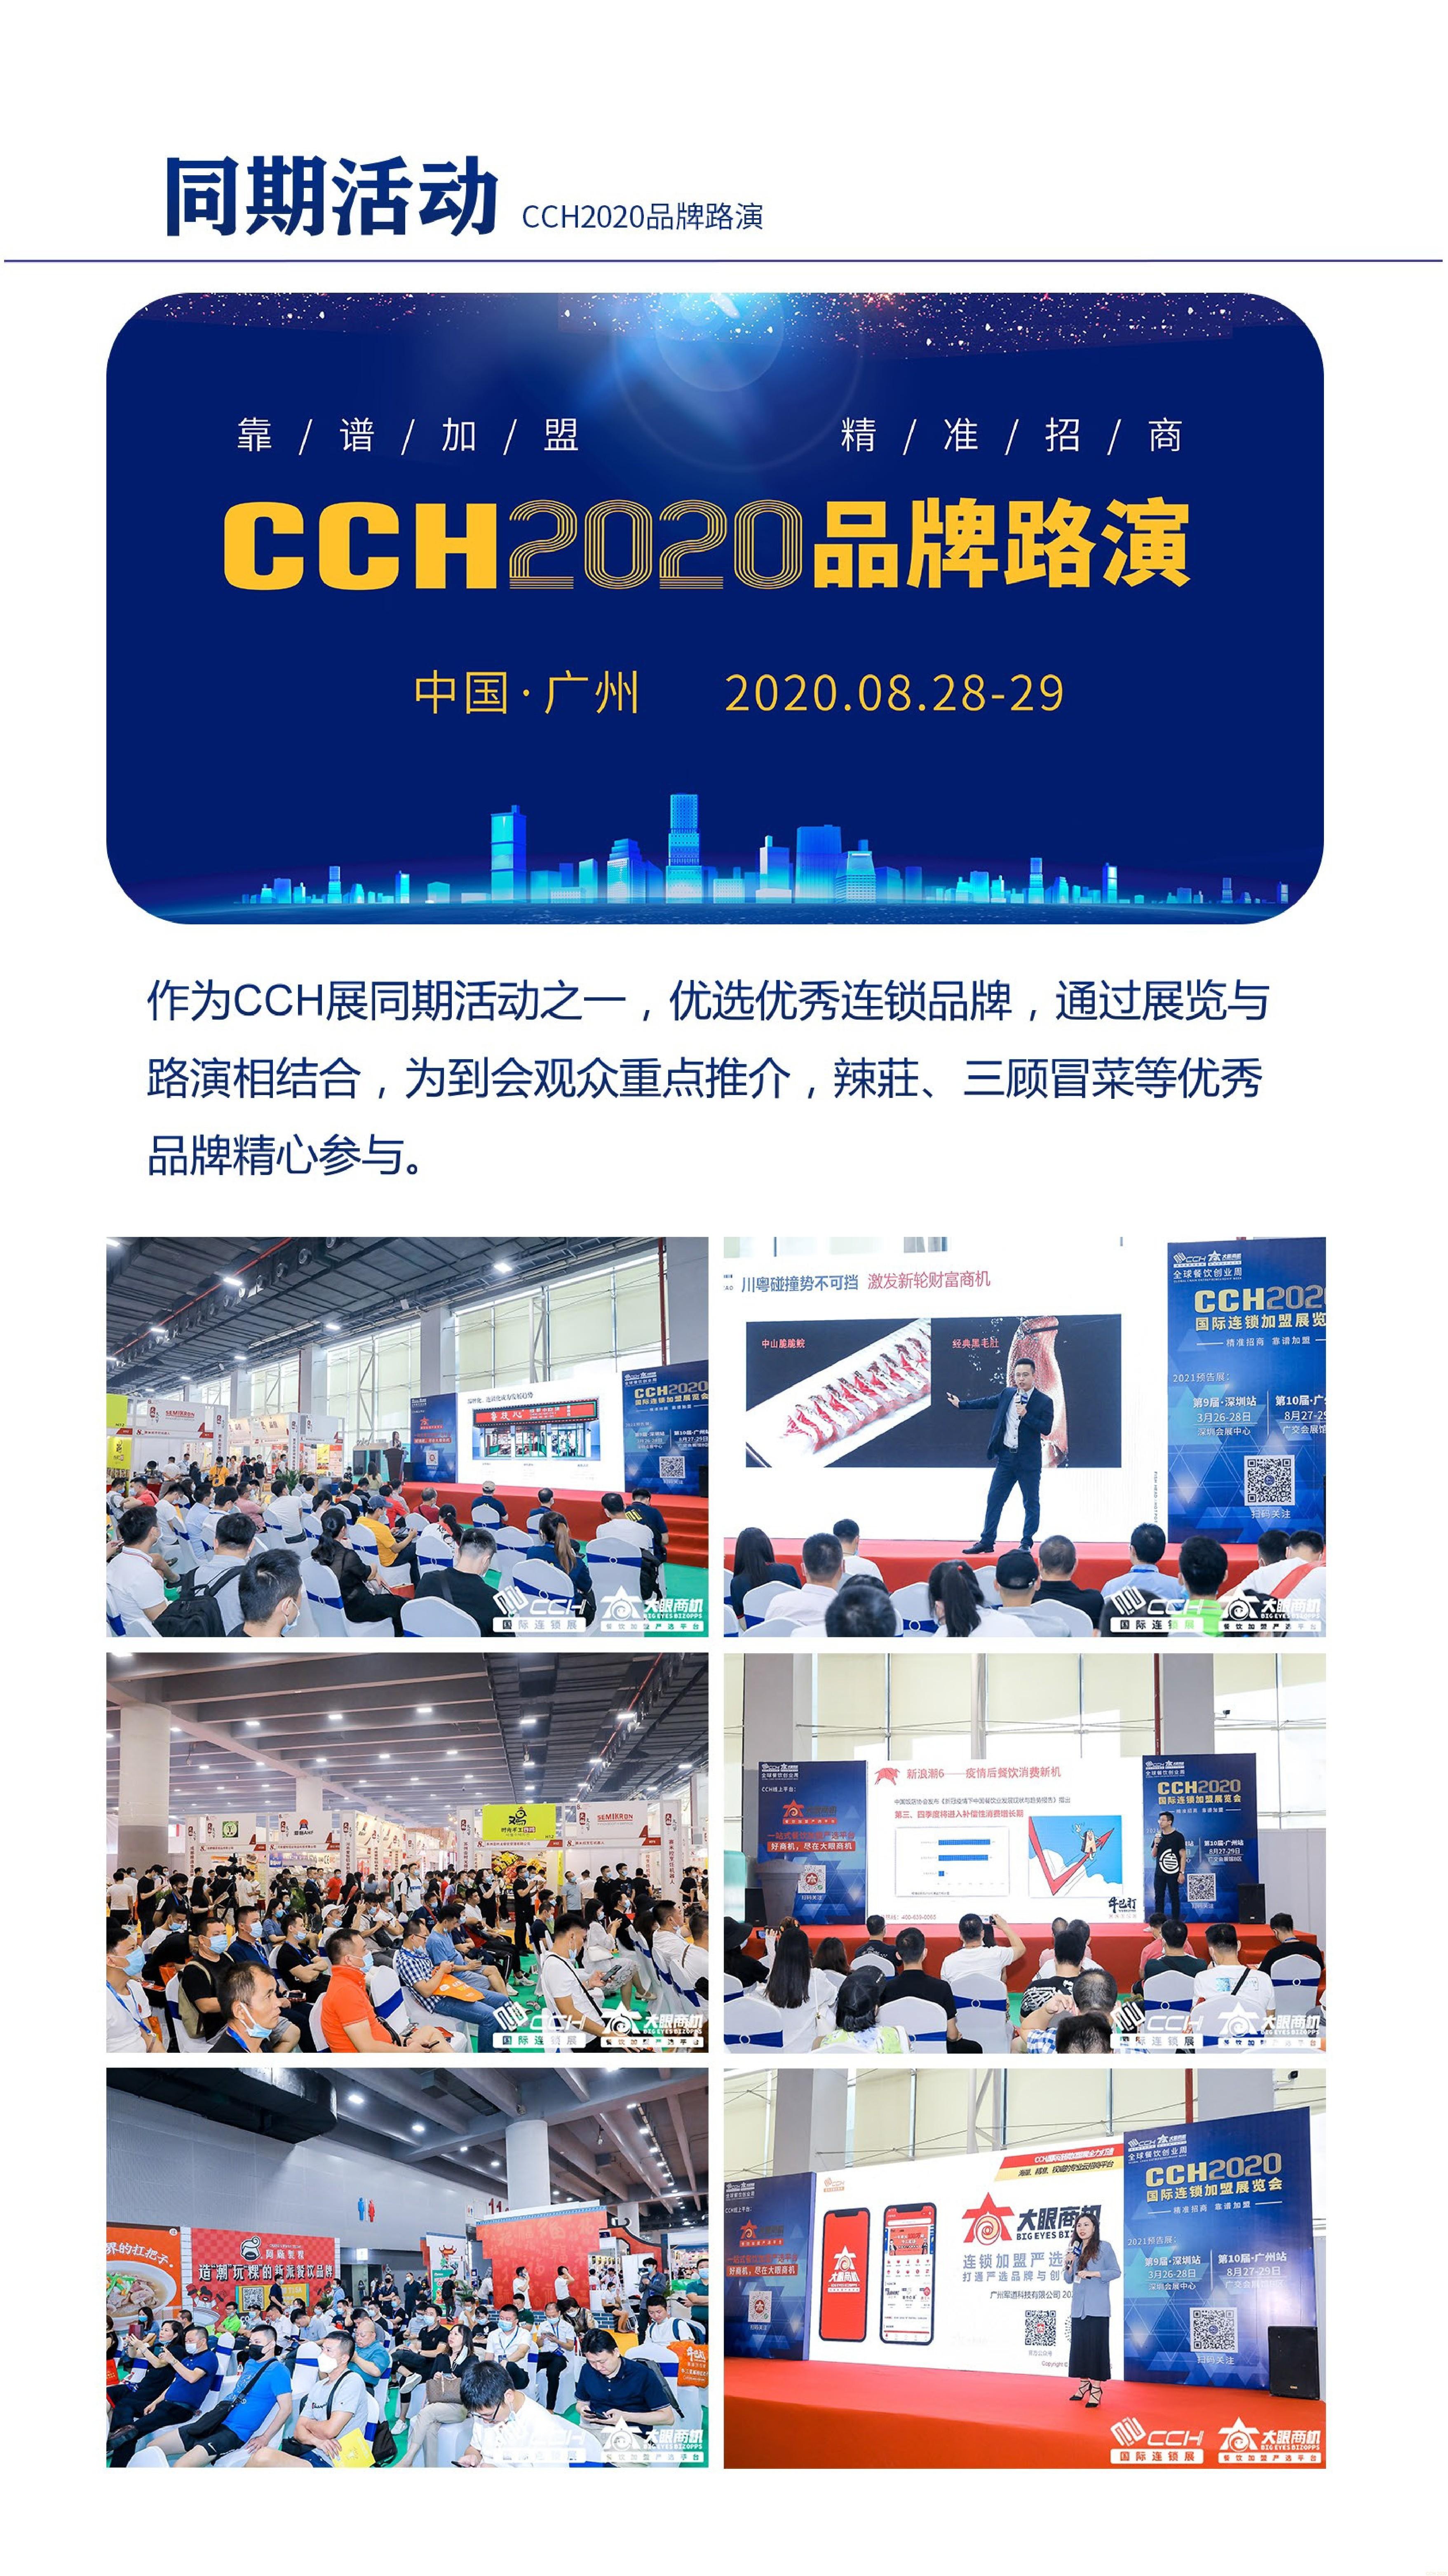 CCH2021-餐饮邀请函·赵(2)(1)-014.jpg